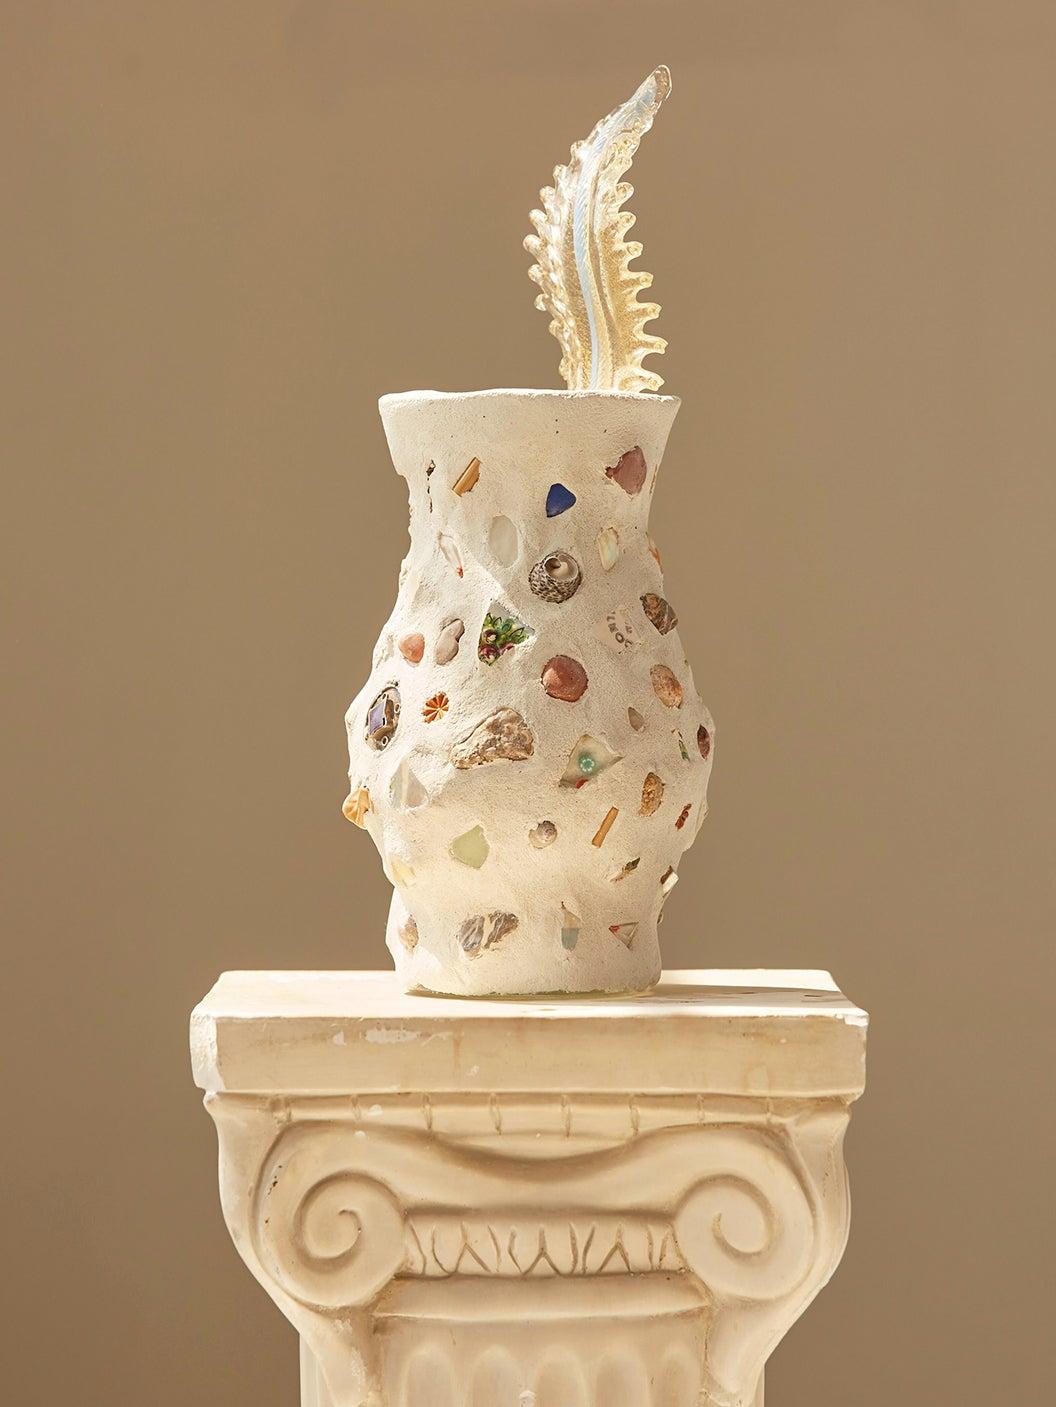 00-FEATURE-trinket-cermanic-vase-domino